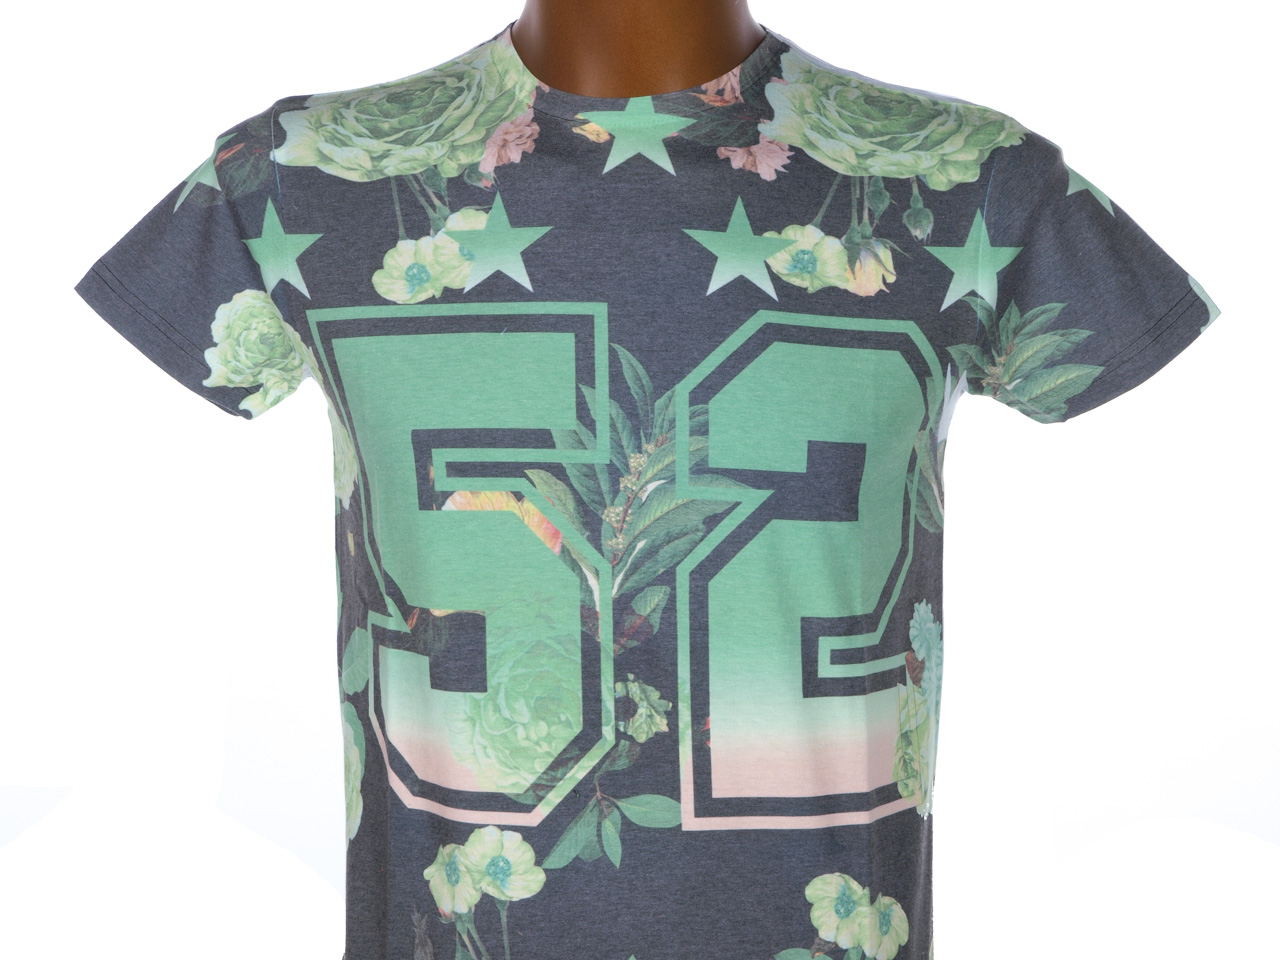 Tee-shirt-manches-courtes-Biaggio-Lanas-vert-mc-tee-Vert-65239-Neuf